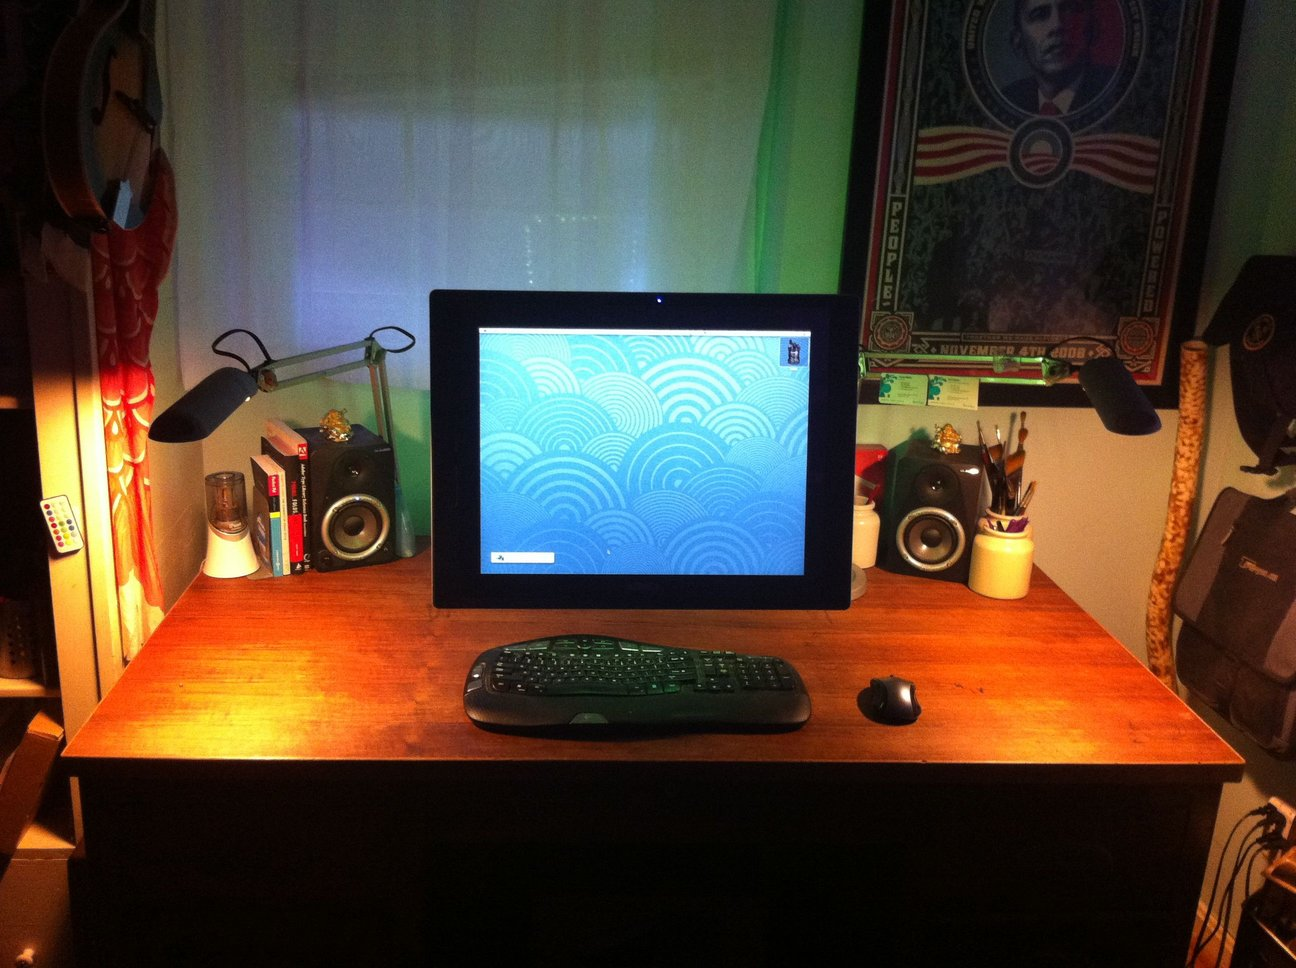 dioder lighting. dioder monitor relief lights lighting